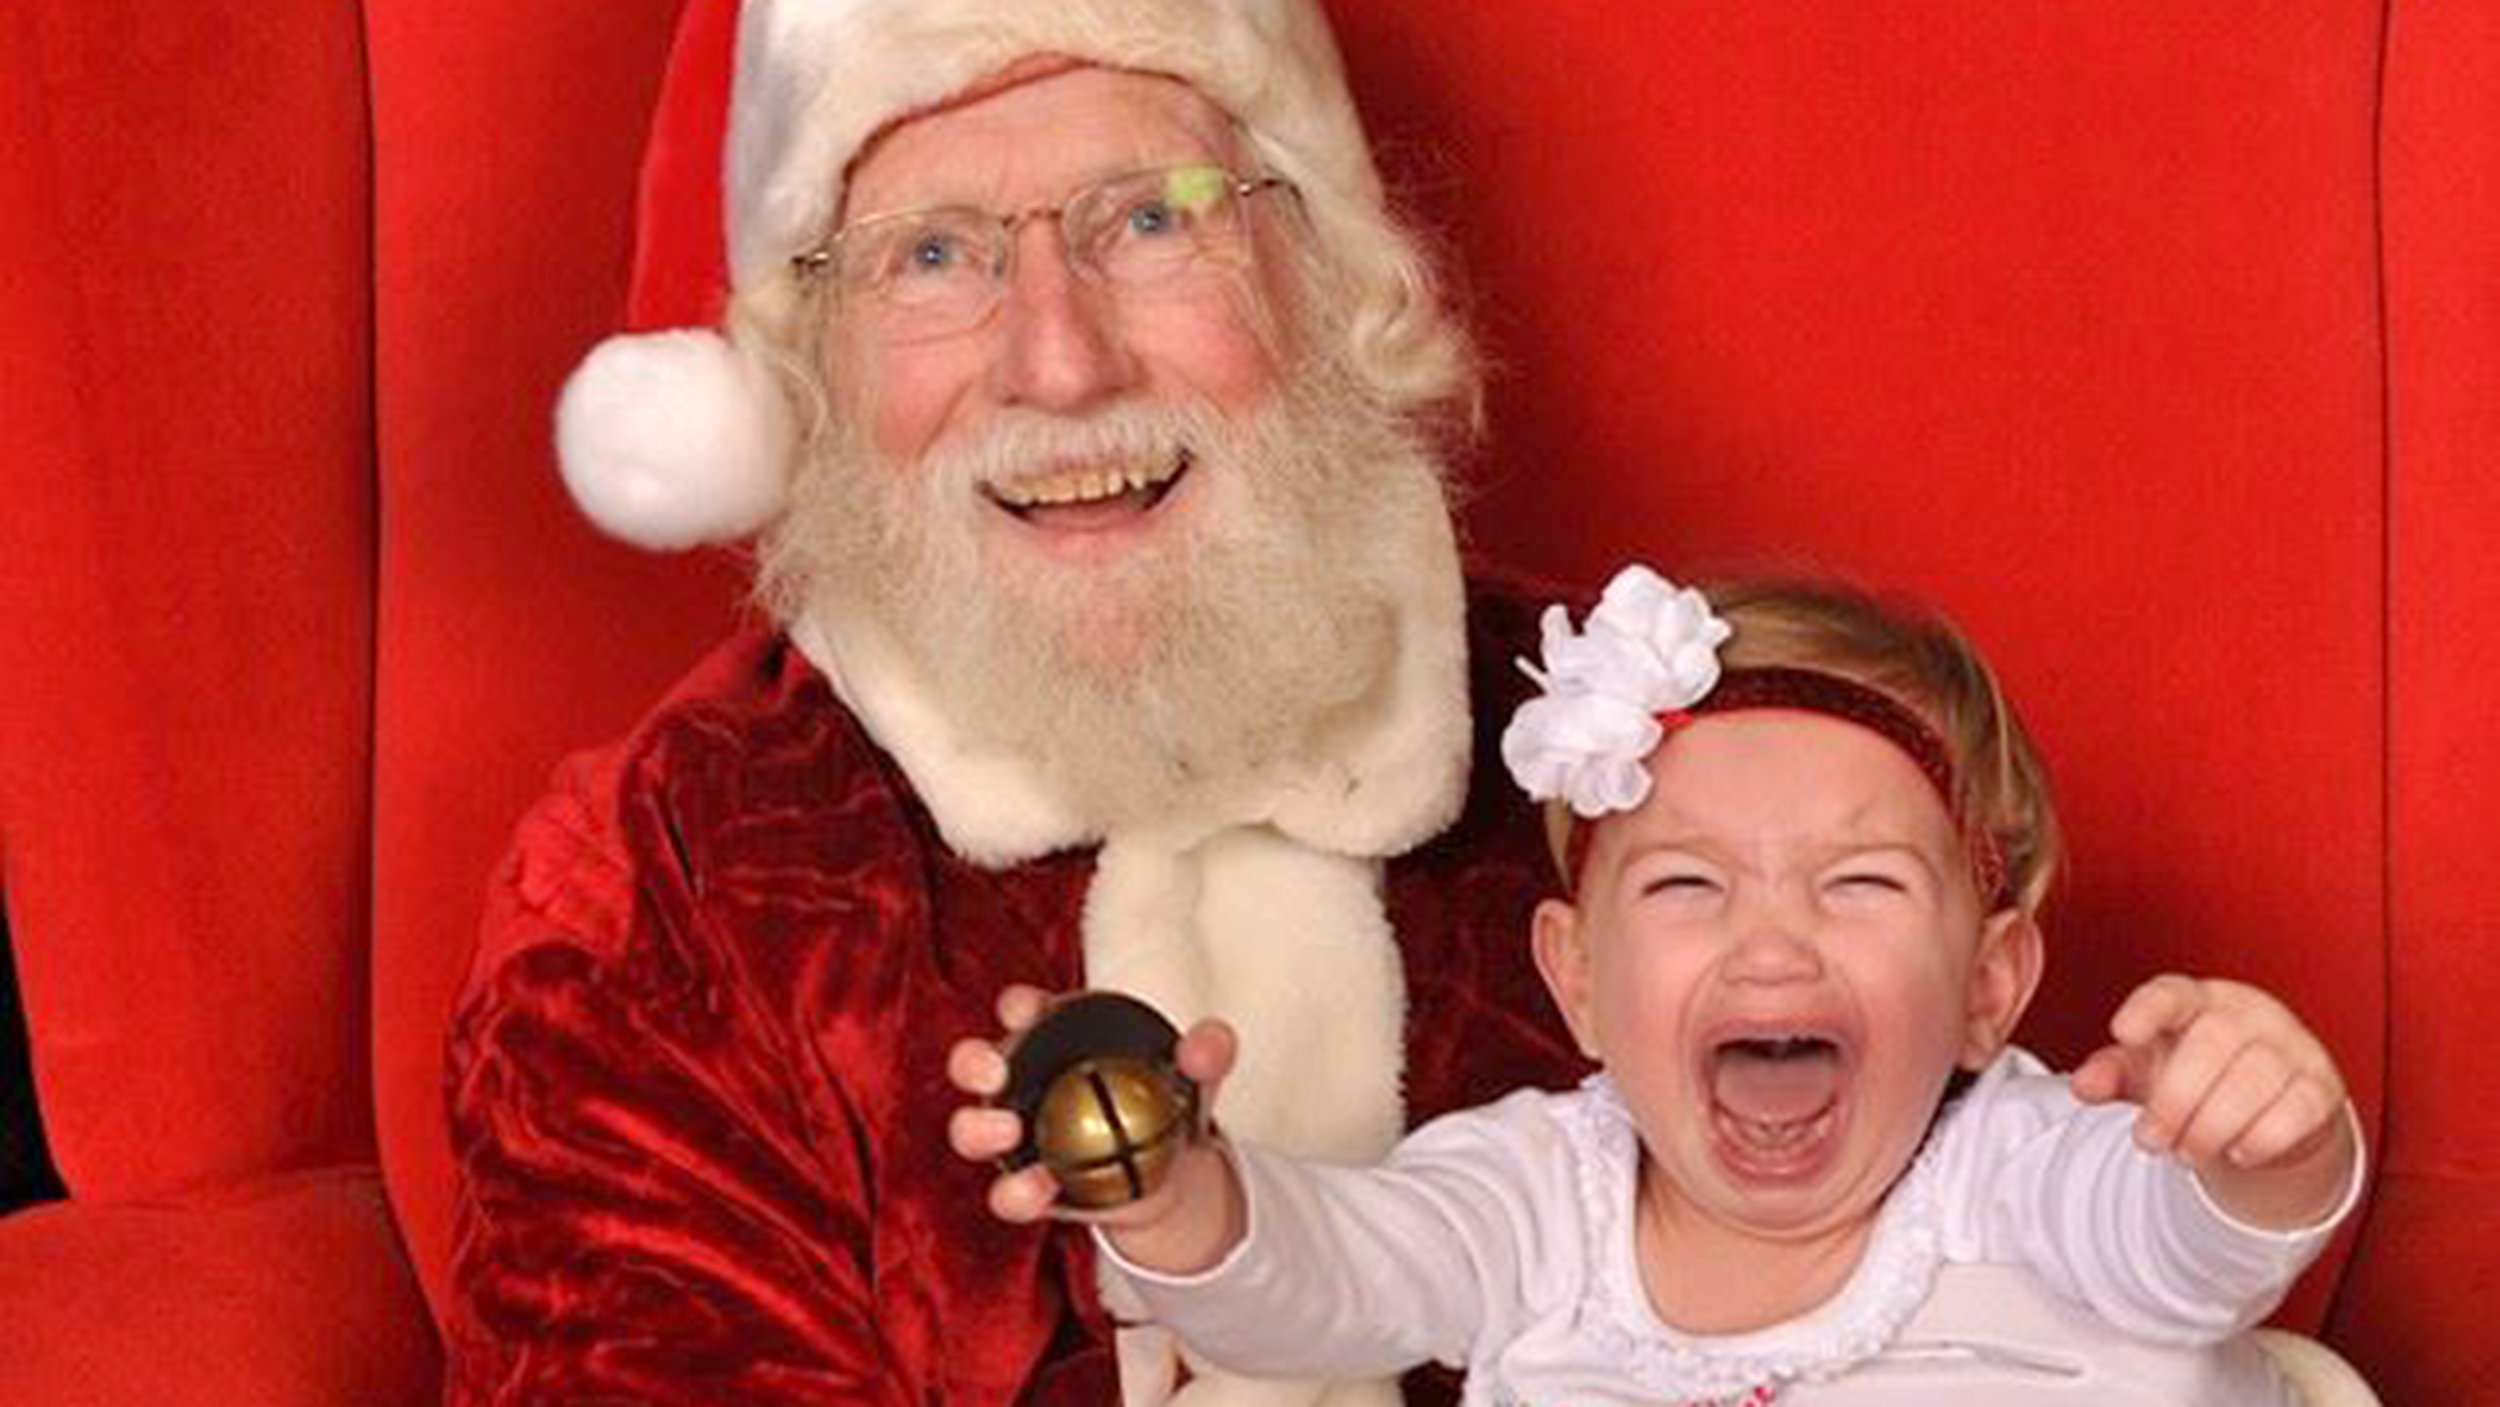 Kids Scared Santa 15 Photos Hilarious Ho Ho Horror 1D80366020 on Scary Baby Crying